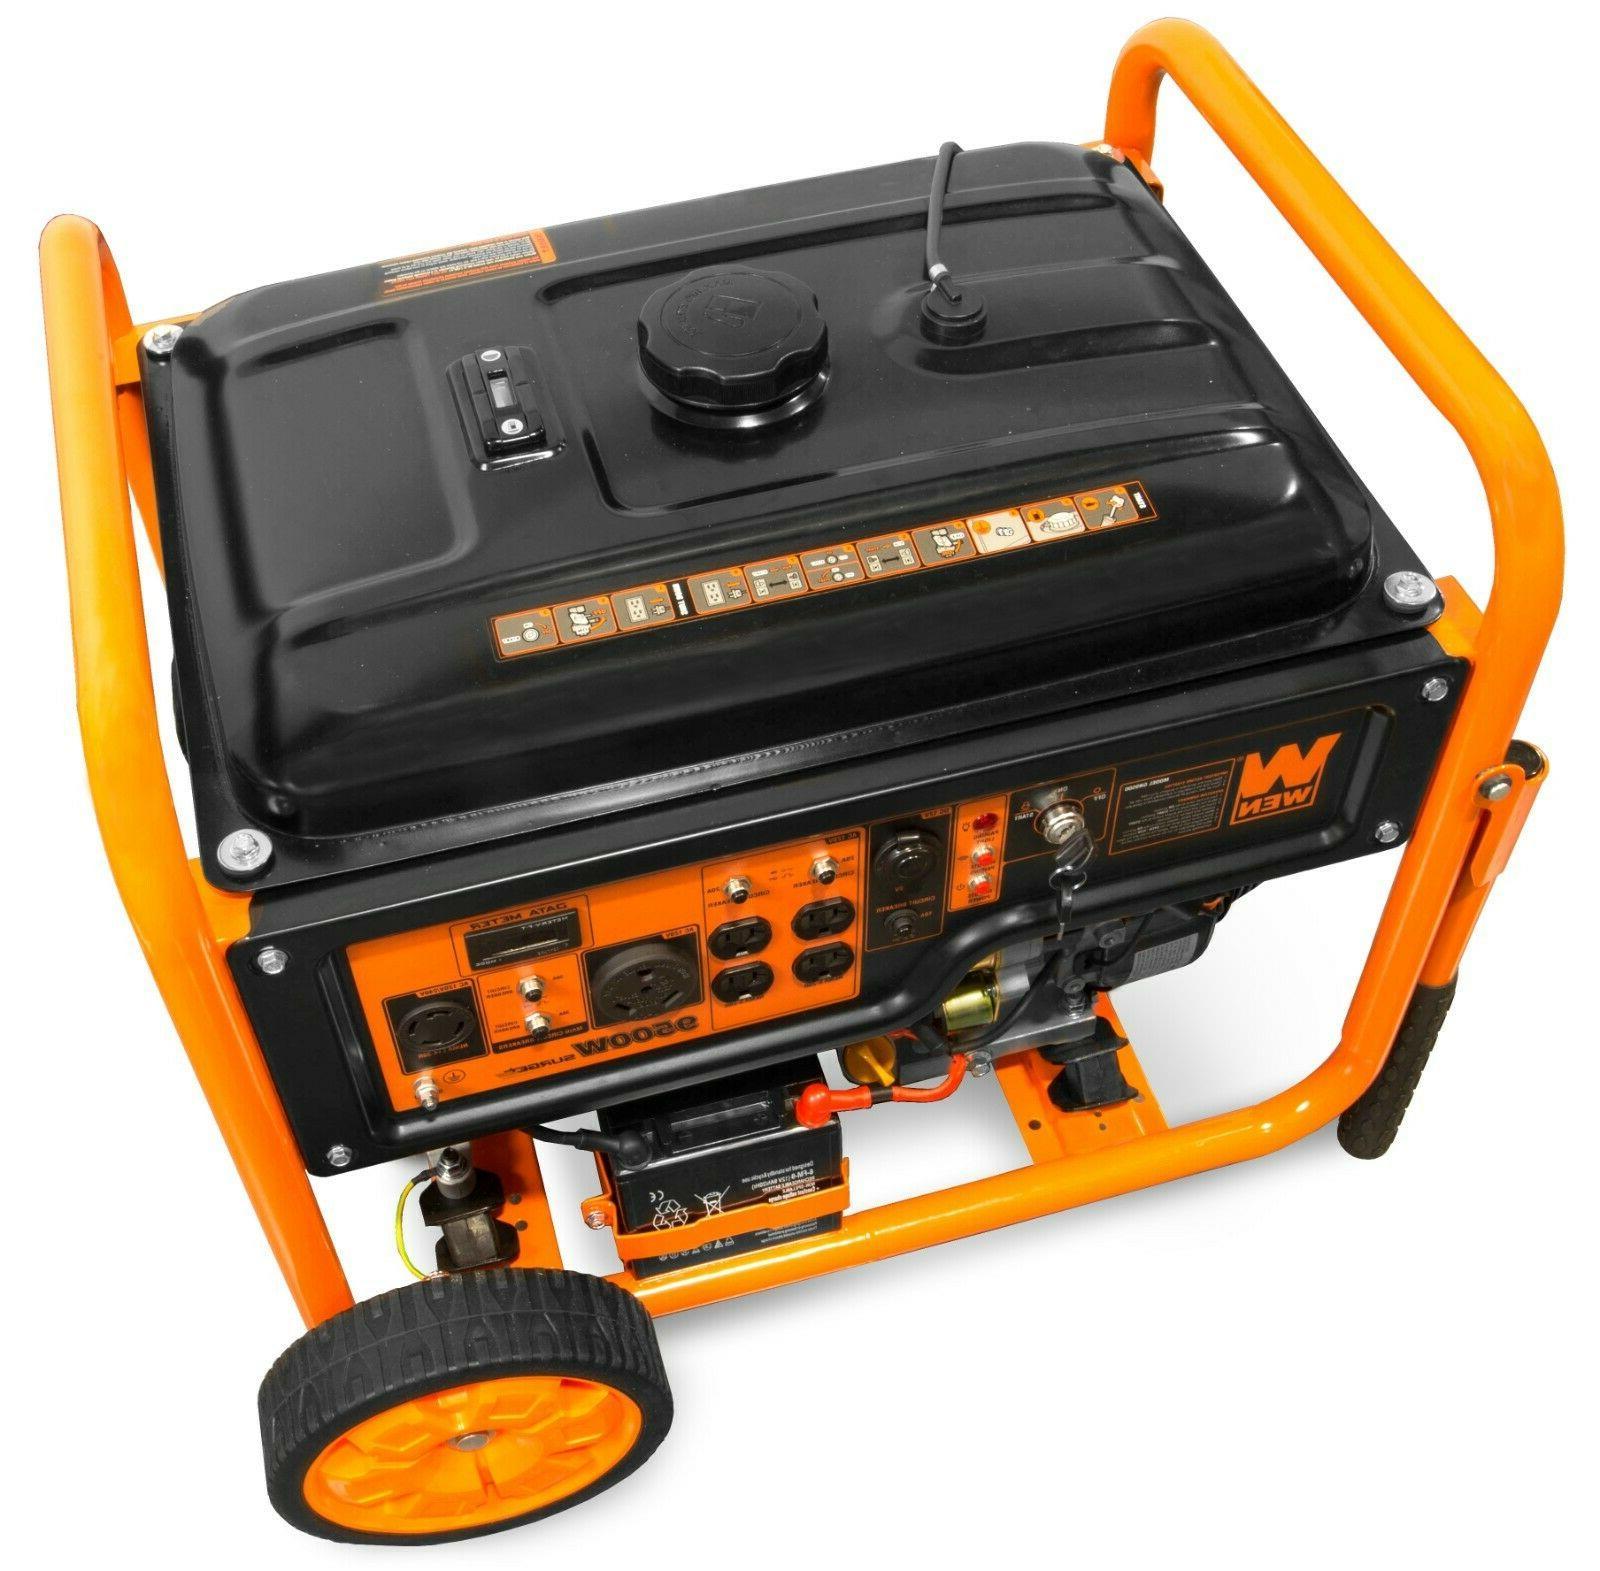 WEN GN9500 Transfer Ready 120V/240V Portable Generator